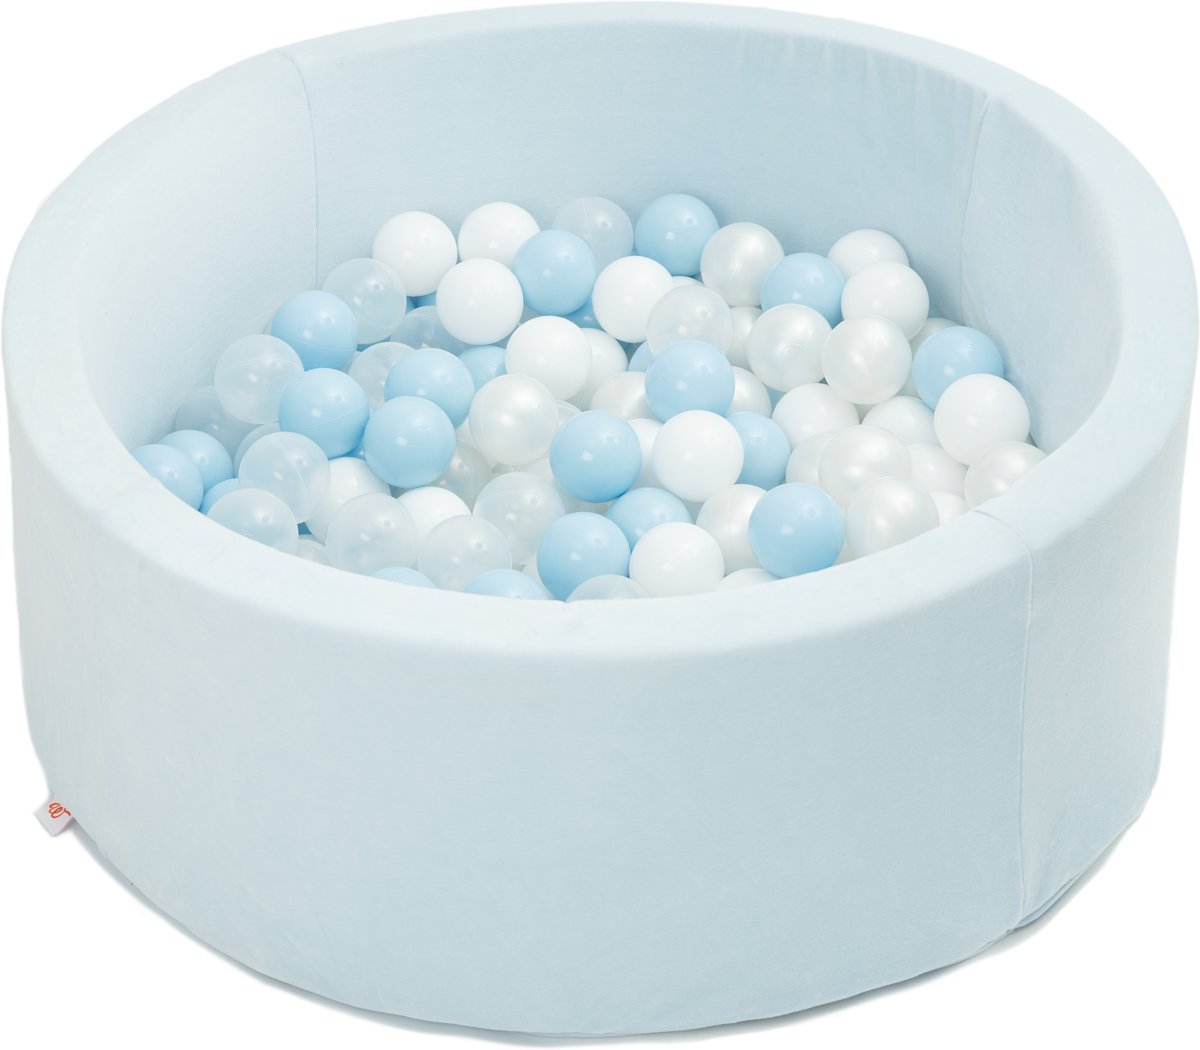 FUJL - Ballenbak - Speelbak - Licht blauw - ⌀ 90 cm - 200 ballen - Kleuren - blauw - Parel  -Wit - Transparant